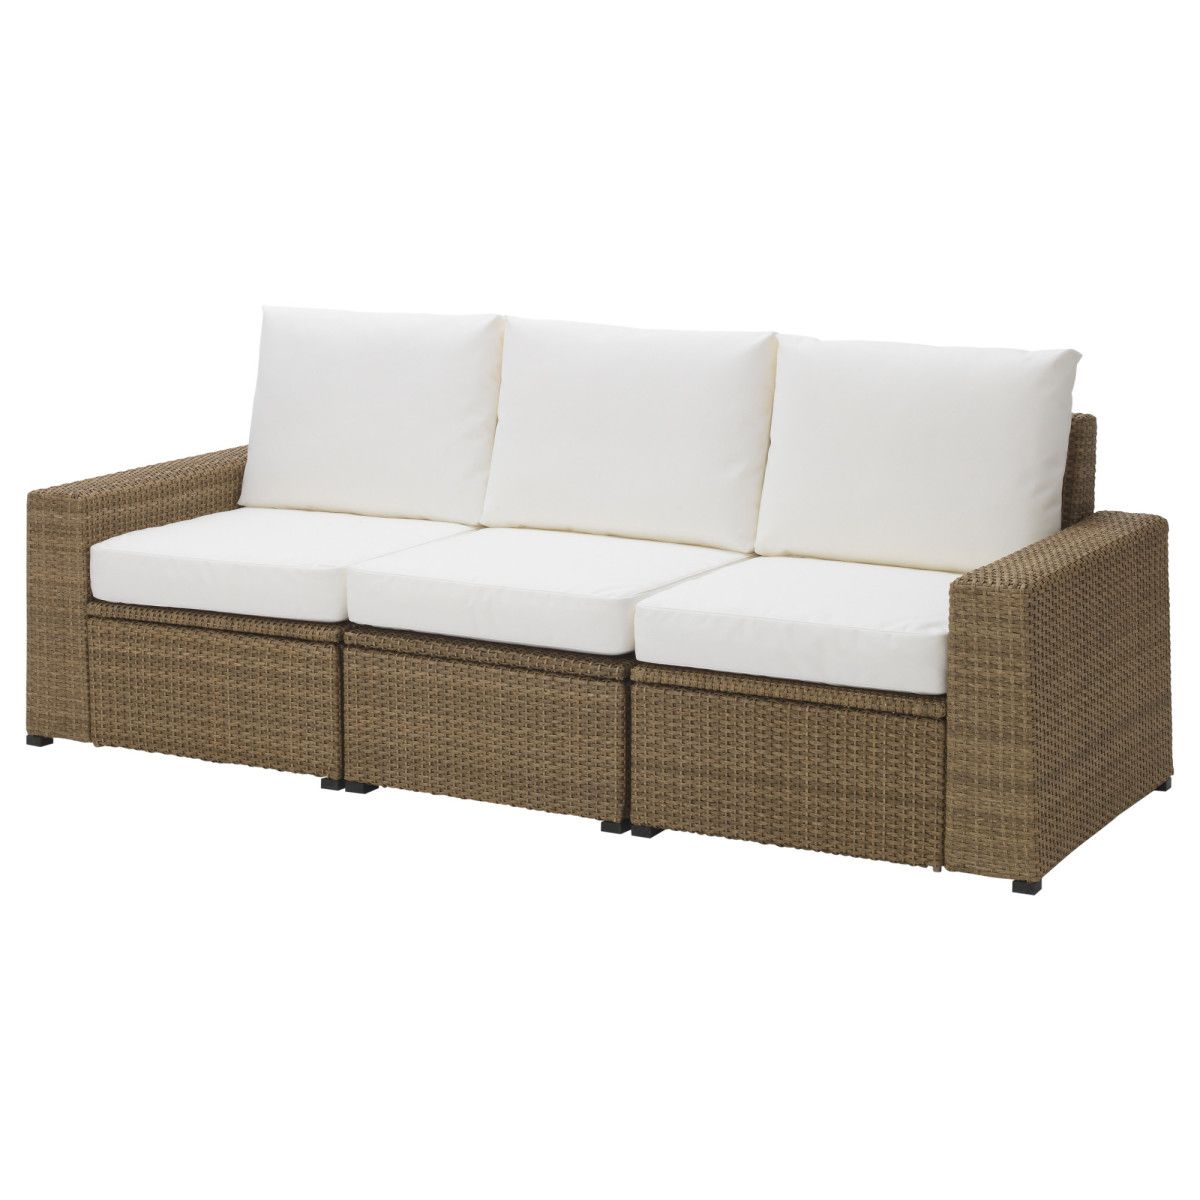 SOLLERÖN, 3er Sofa/außen, Braun, Weiß Jetzt Bestellen Unter:  Https://moebel.ladendirekt.de/garten/gartenmoebel/loungemoebel Garten/?uidu003d955f3595 9fa9 5c45   ...